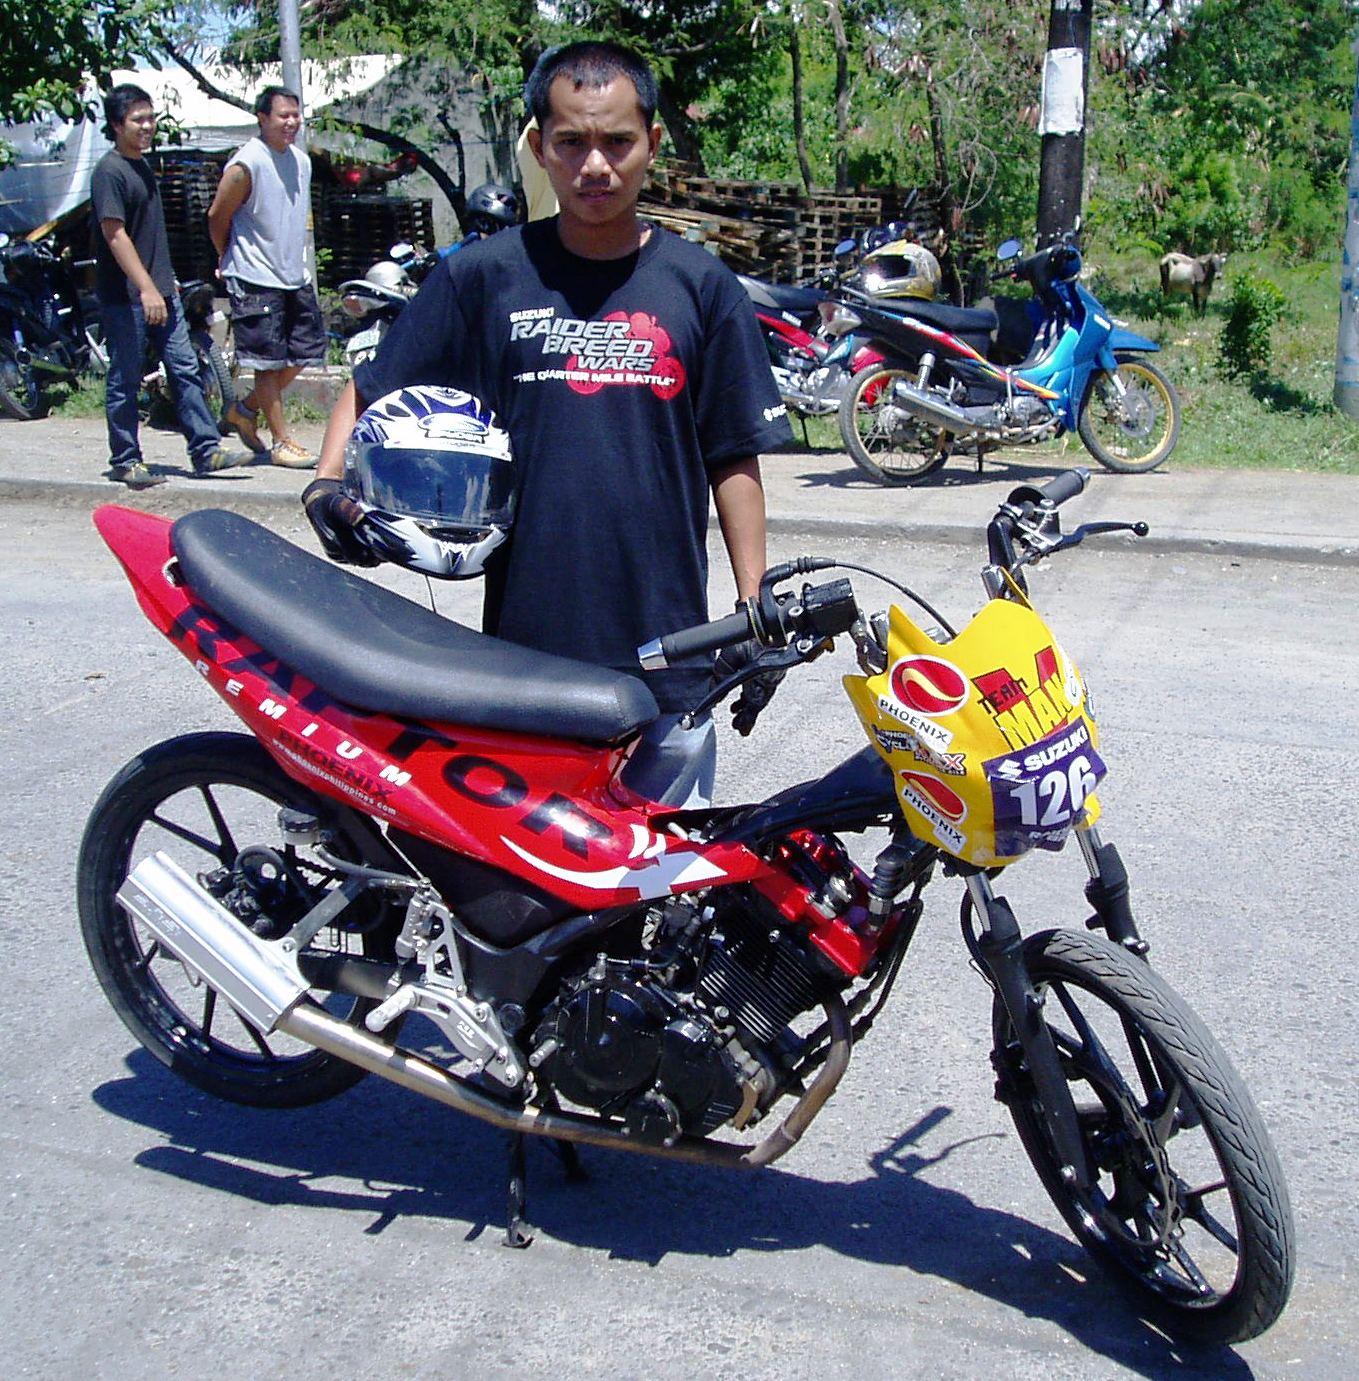 Suzuki Raider J Pro Spec And Price: Phoenix Petroleum Powers V-Man Racers To Nat'l Motorcycle